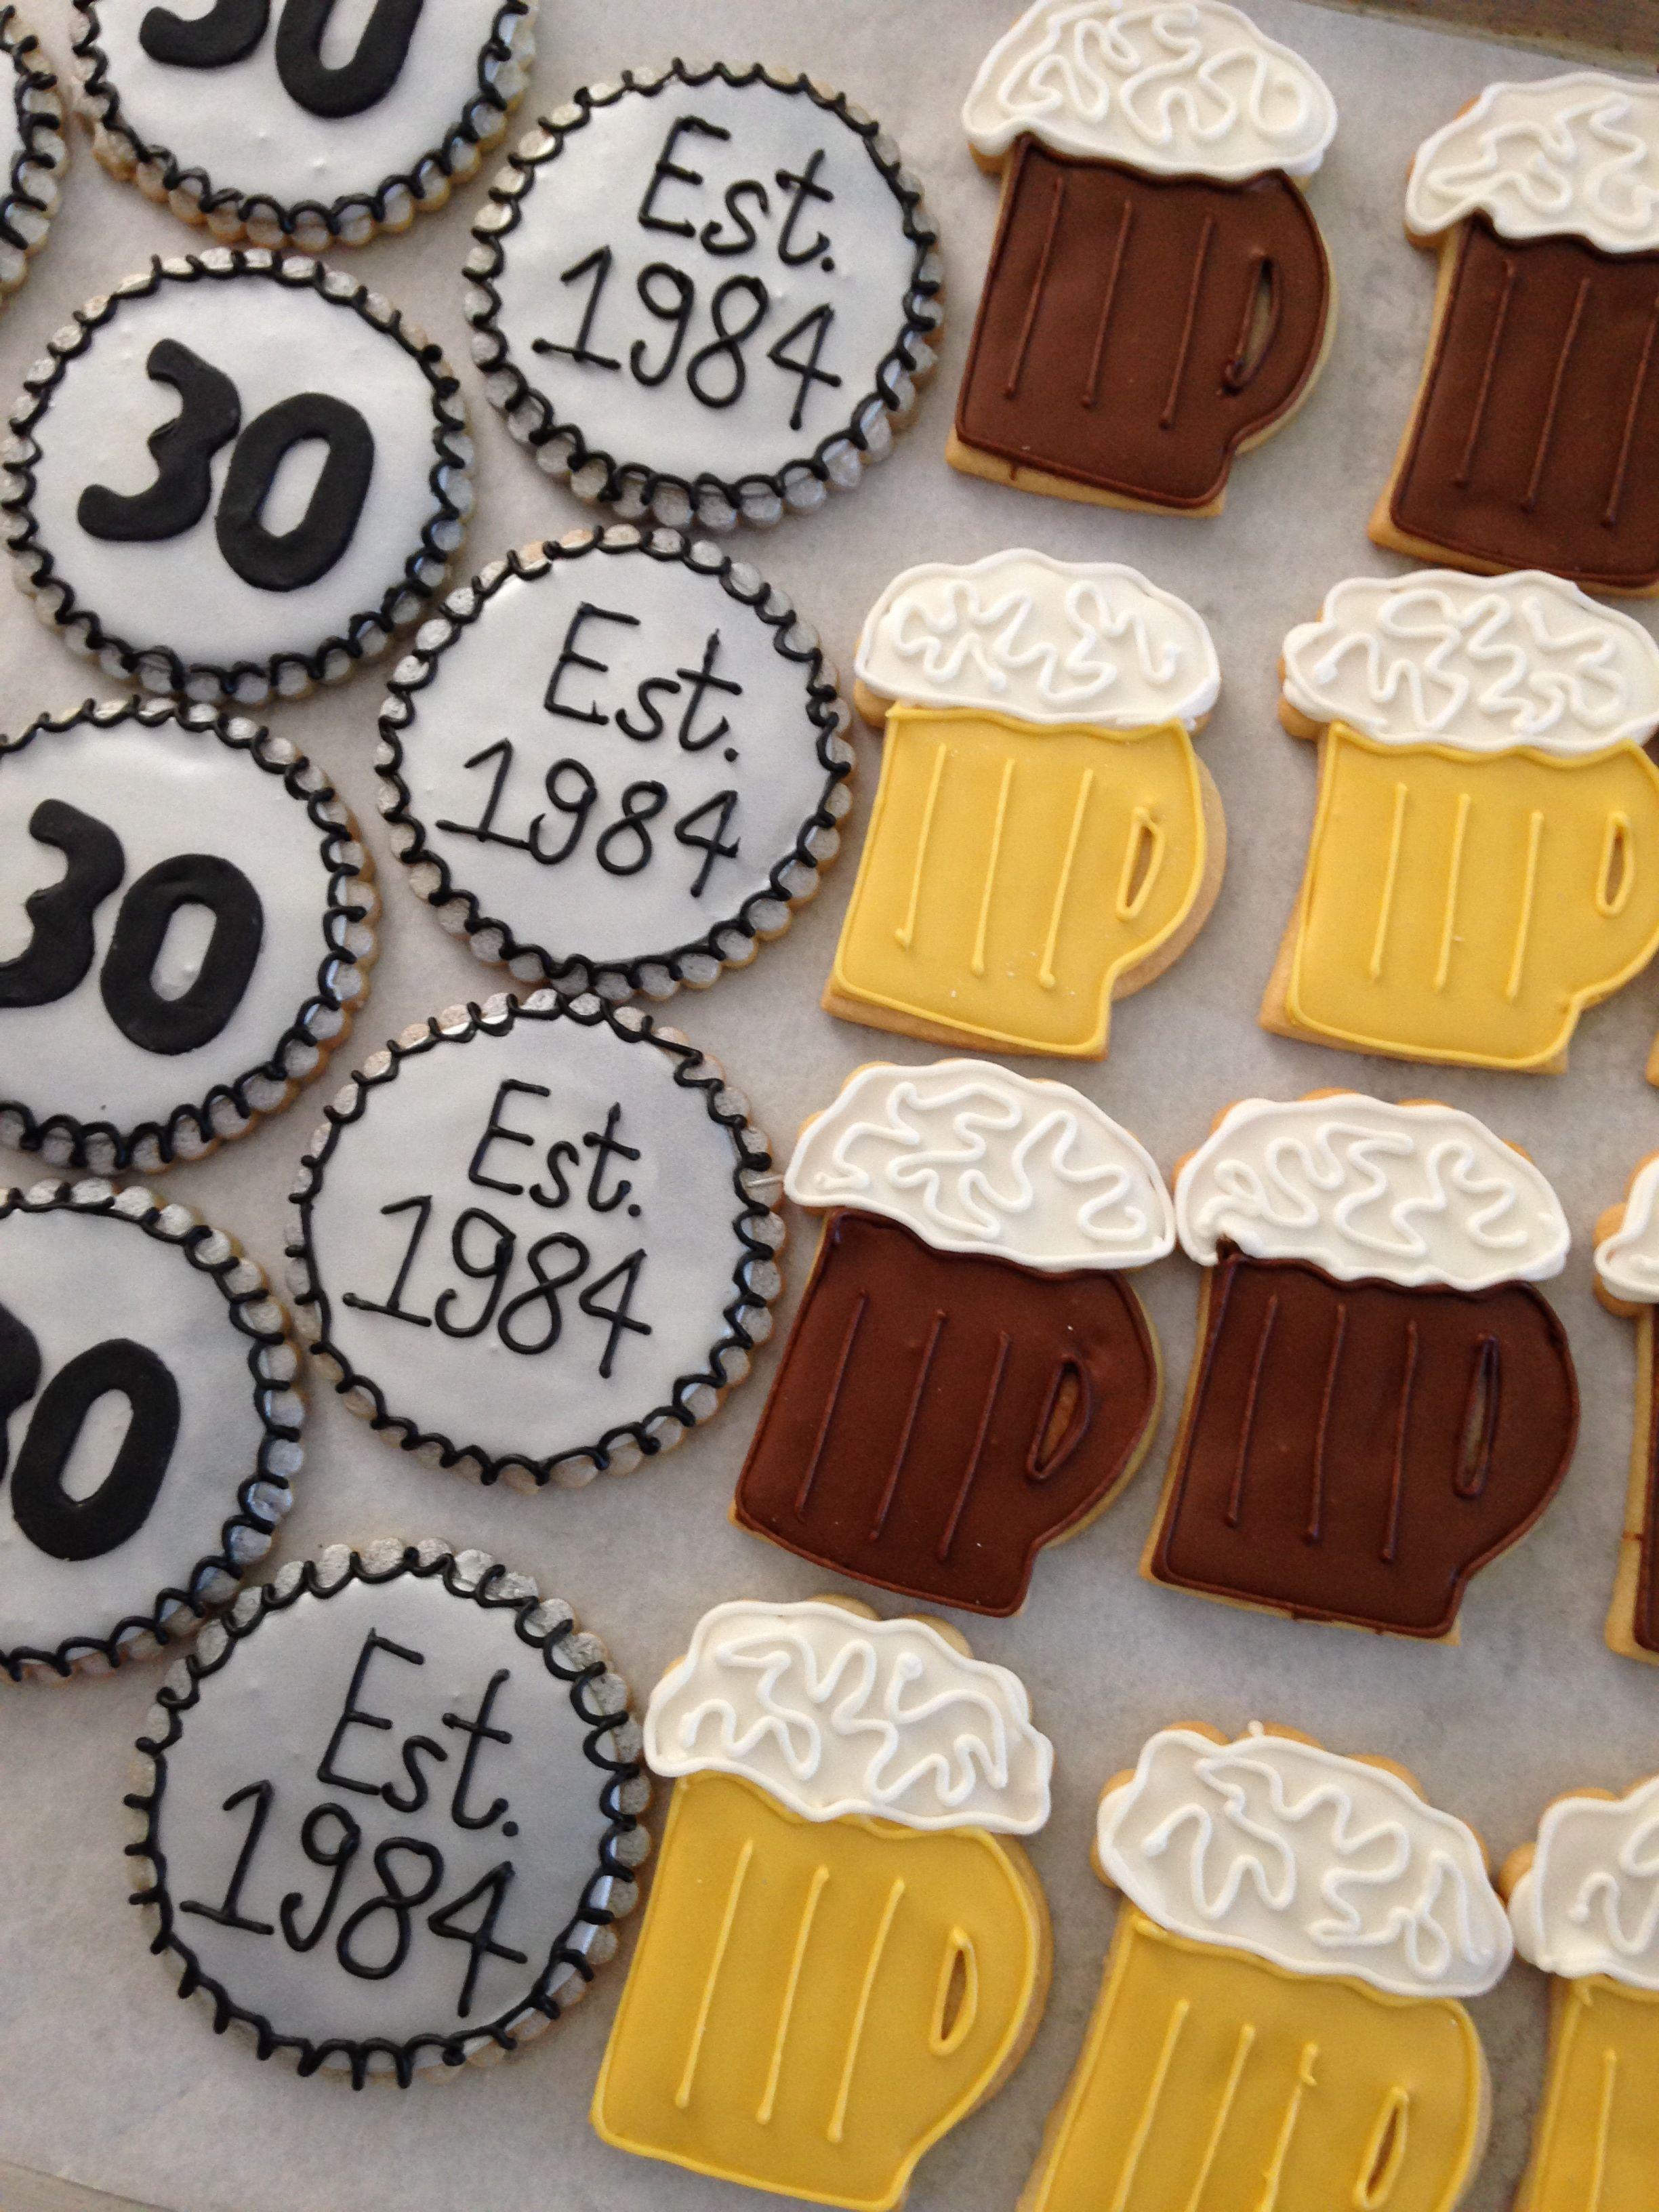 Beer mug and bottle cap cookies birthday in 2019 - Geburtstagsideen zum 90 ...